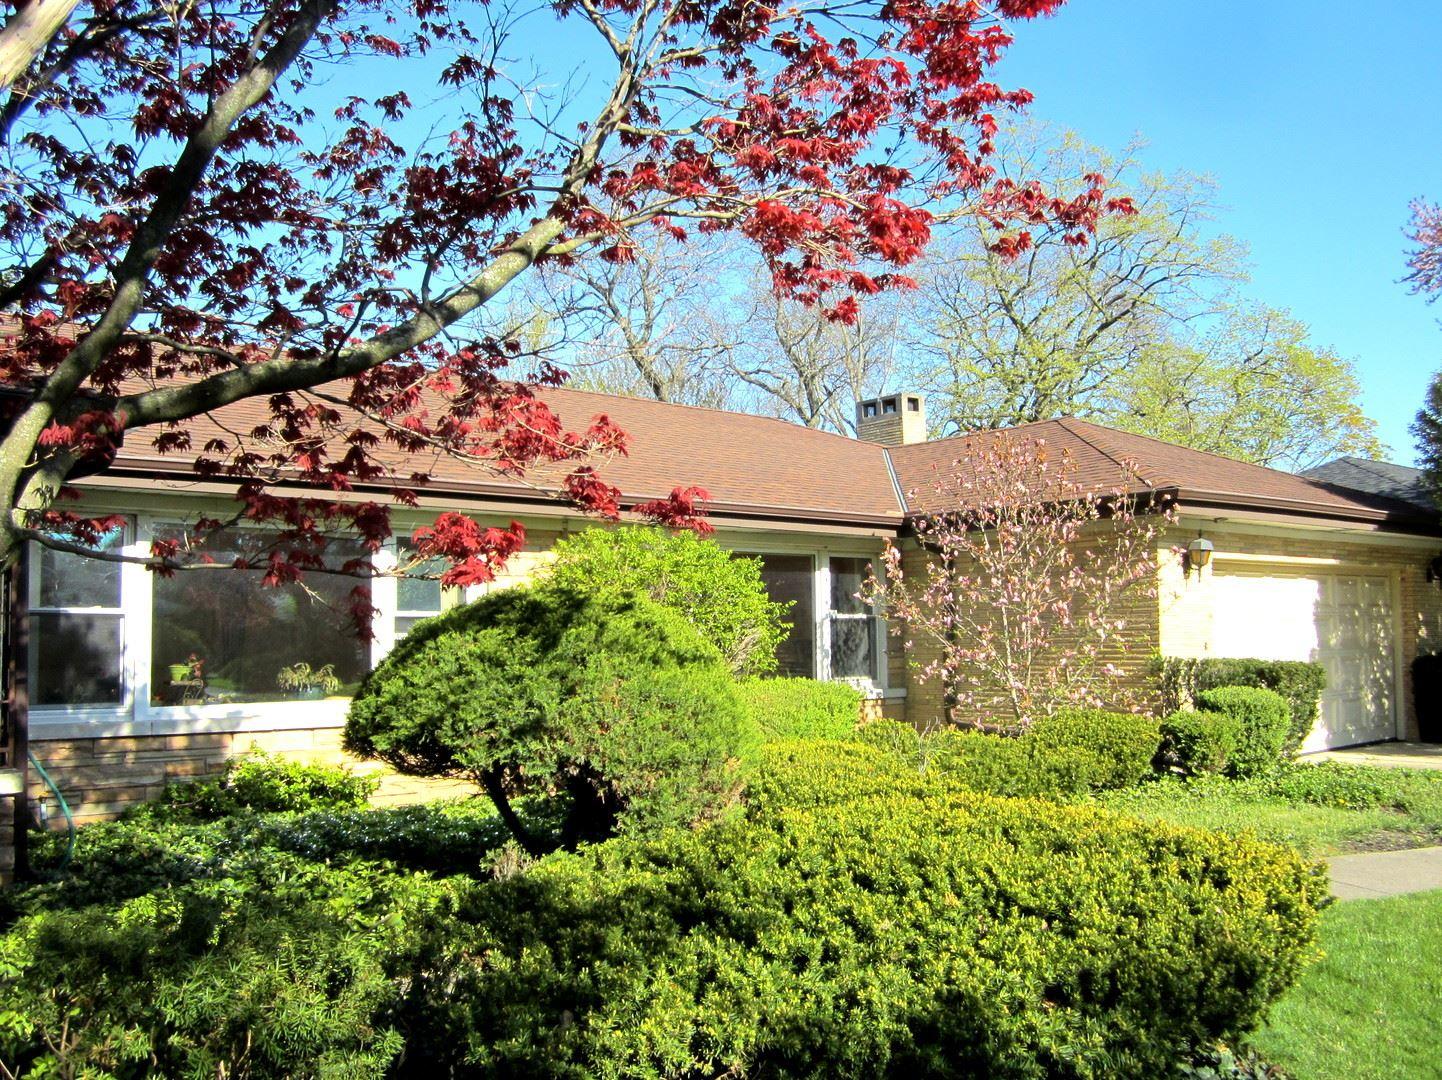 6518 N Kilpatrick Avenue, Lincolnwood, IL 60712 - #: 10742704